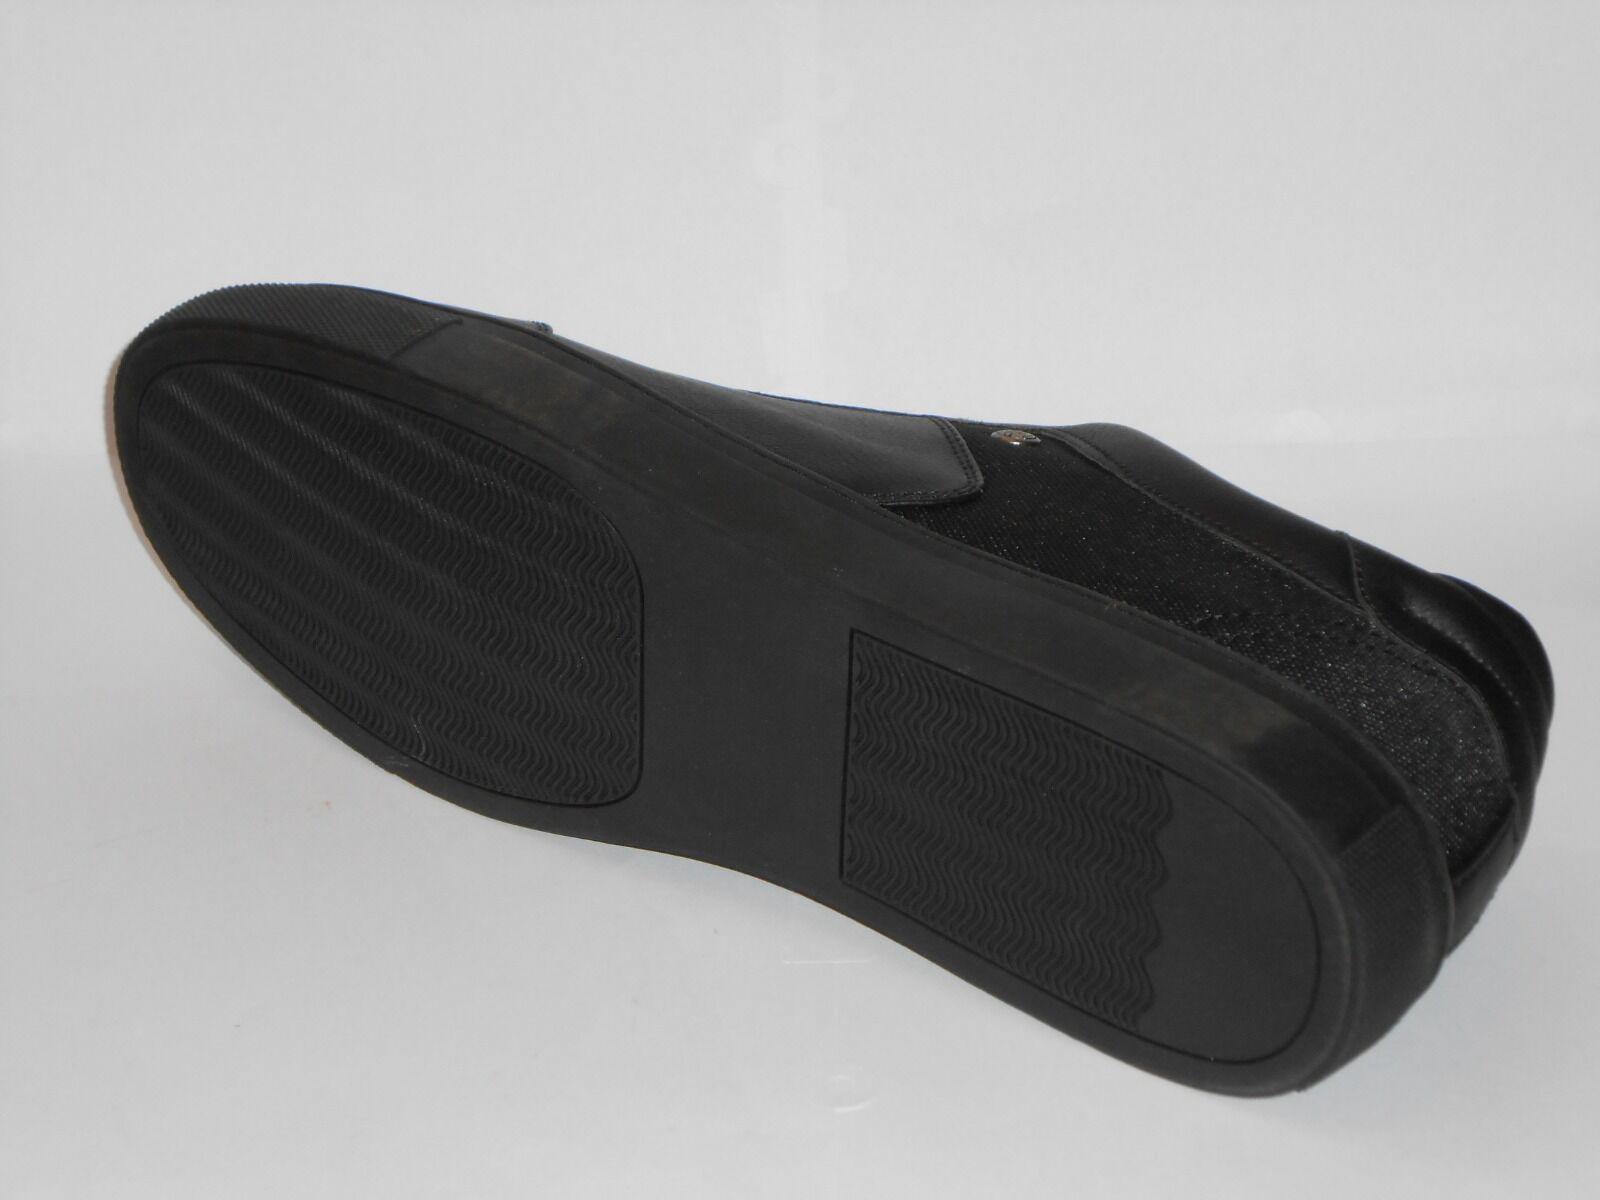 Avon BLACK Uomo Trainer UK 11 SHOES BLACK Avon TRAINER SHOE  /- f5f022